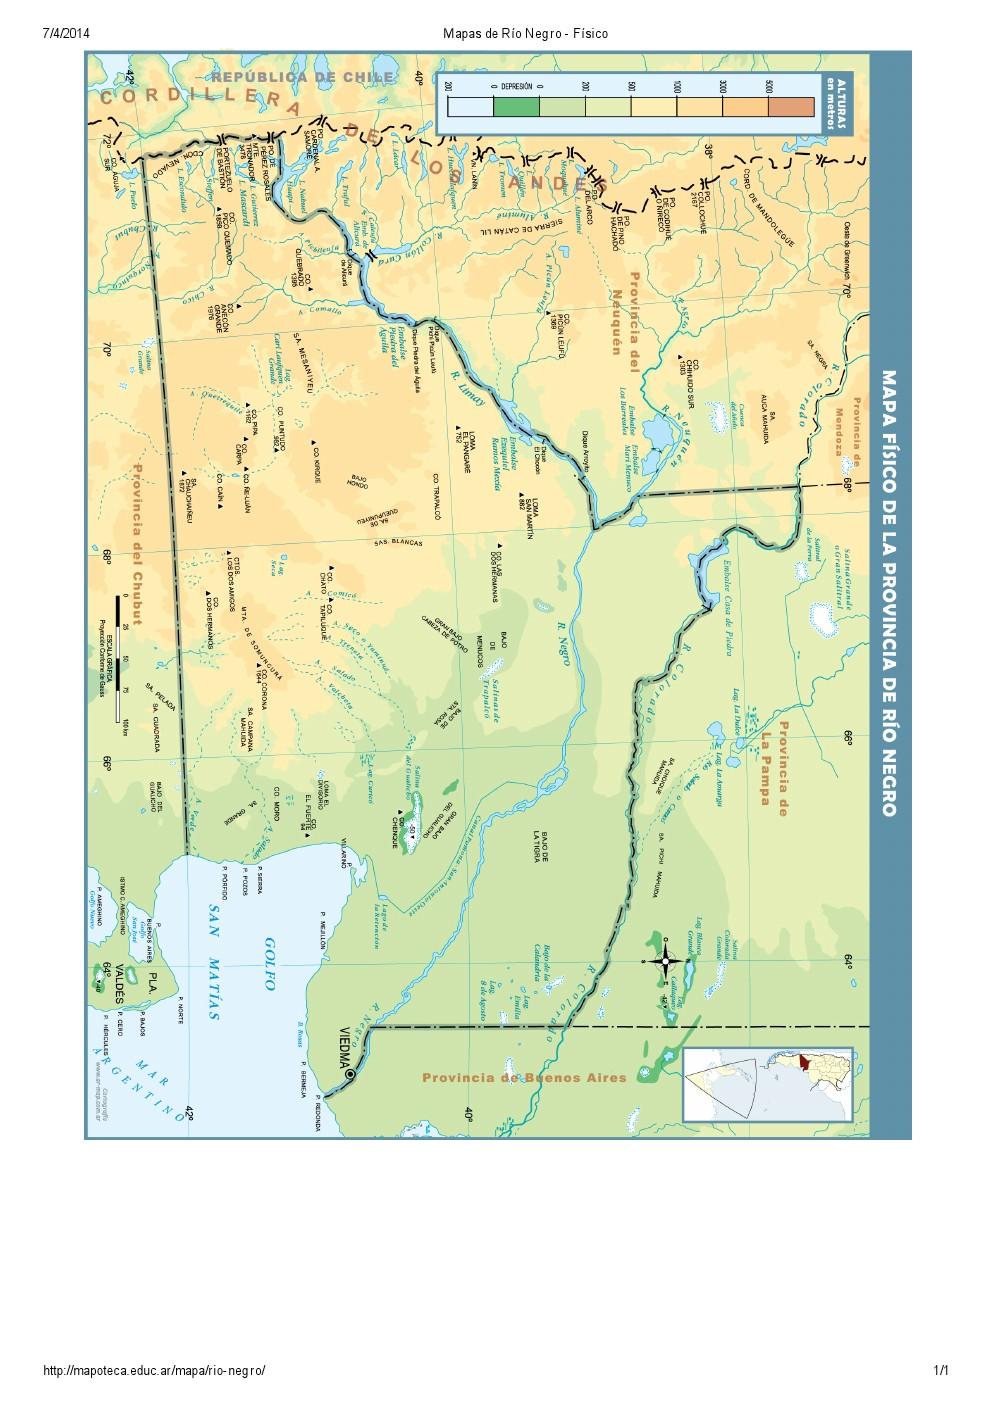 Mapa de ríos de Río Negro. Mapoteca de Educ.ar